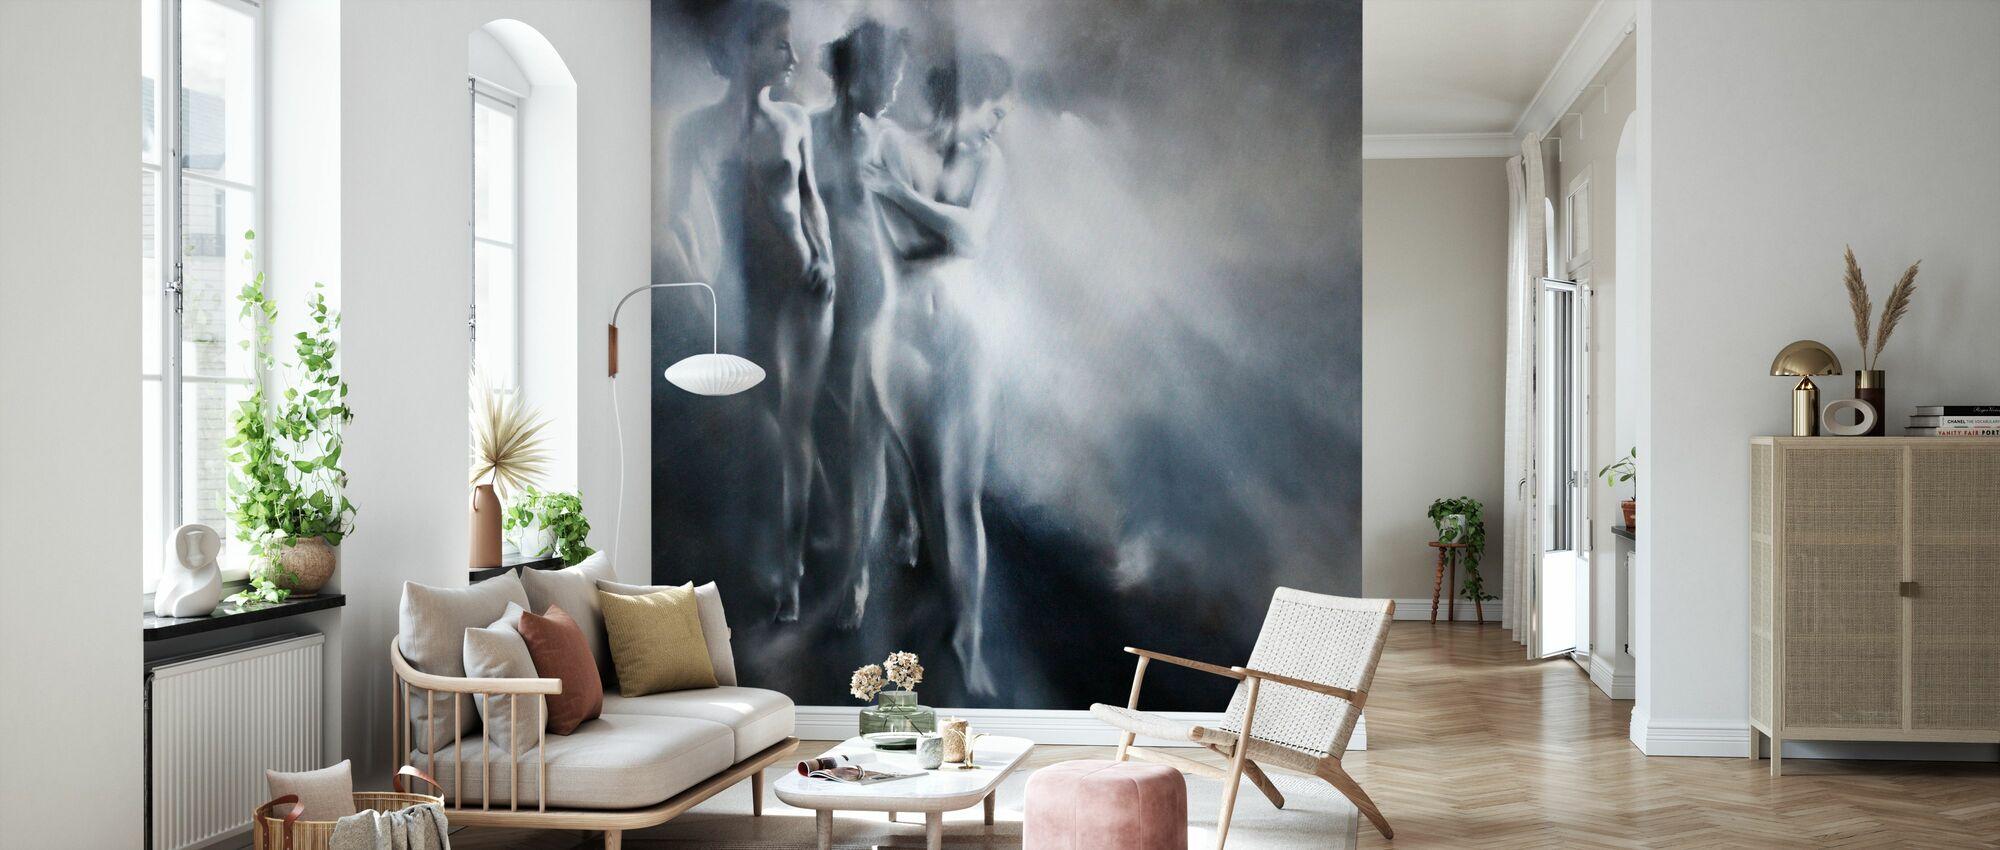 Karla Karla and Karla - Wallpaper - Living Room